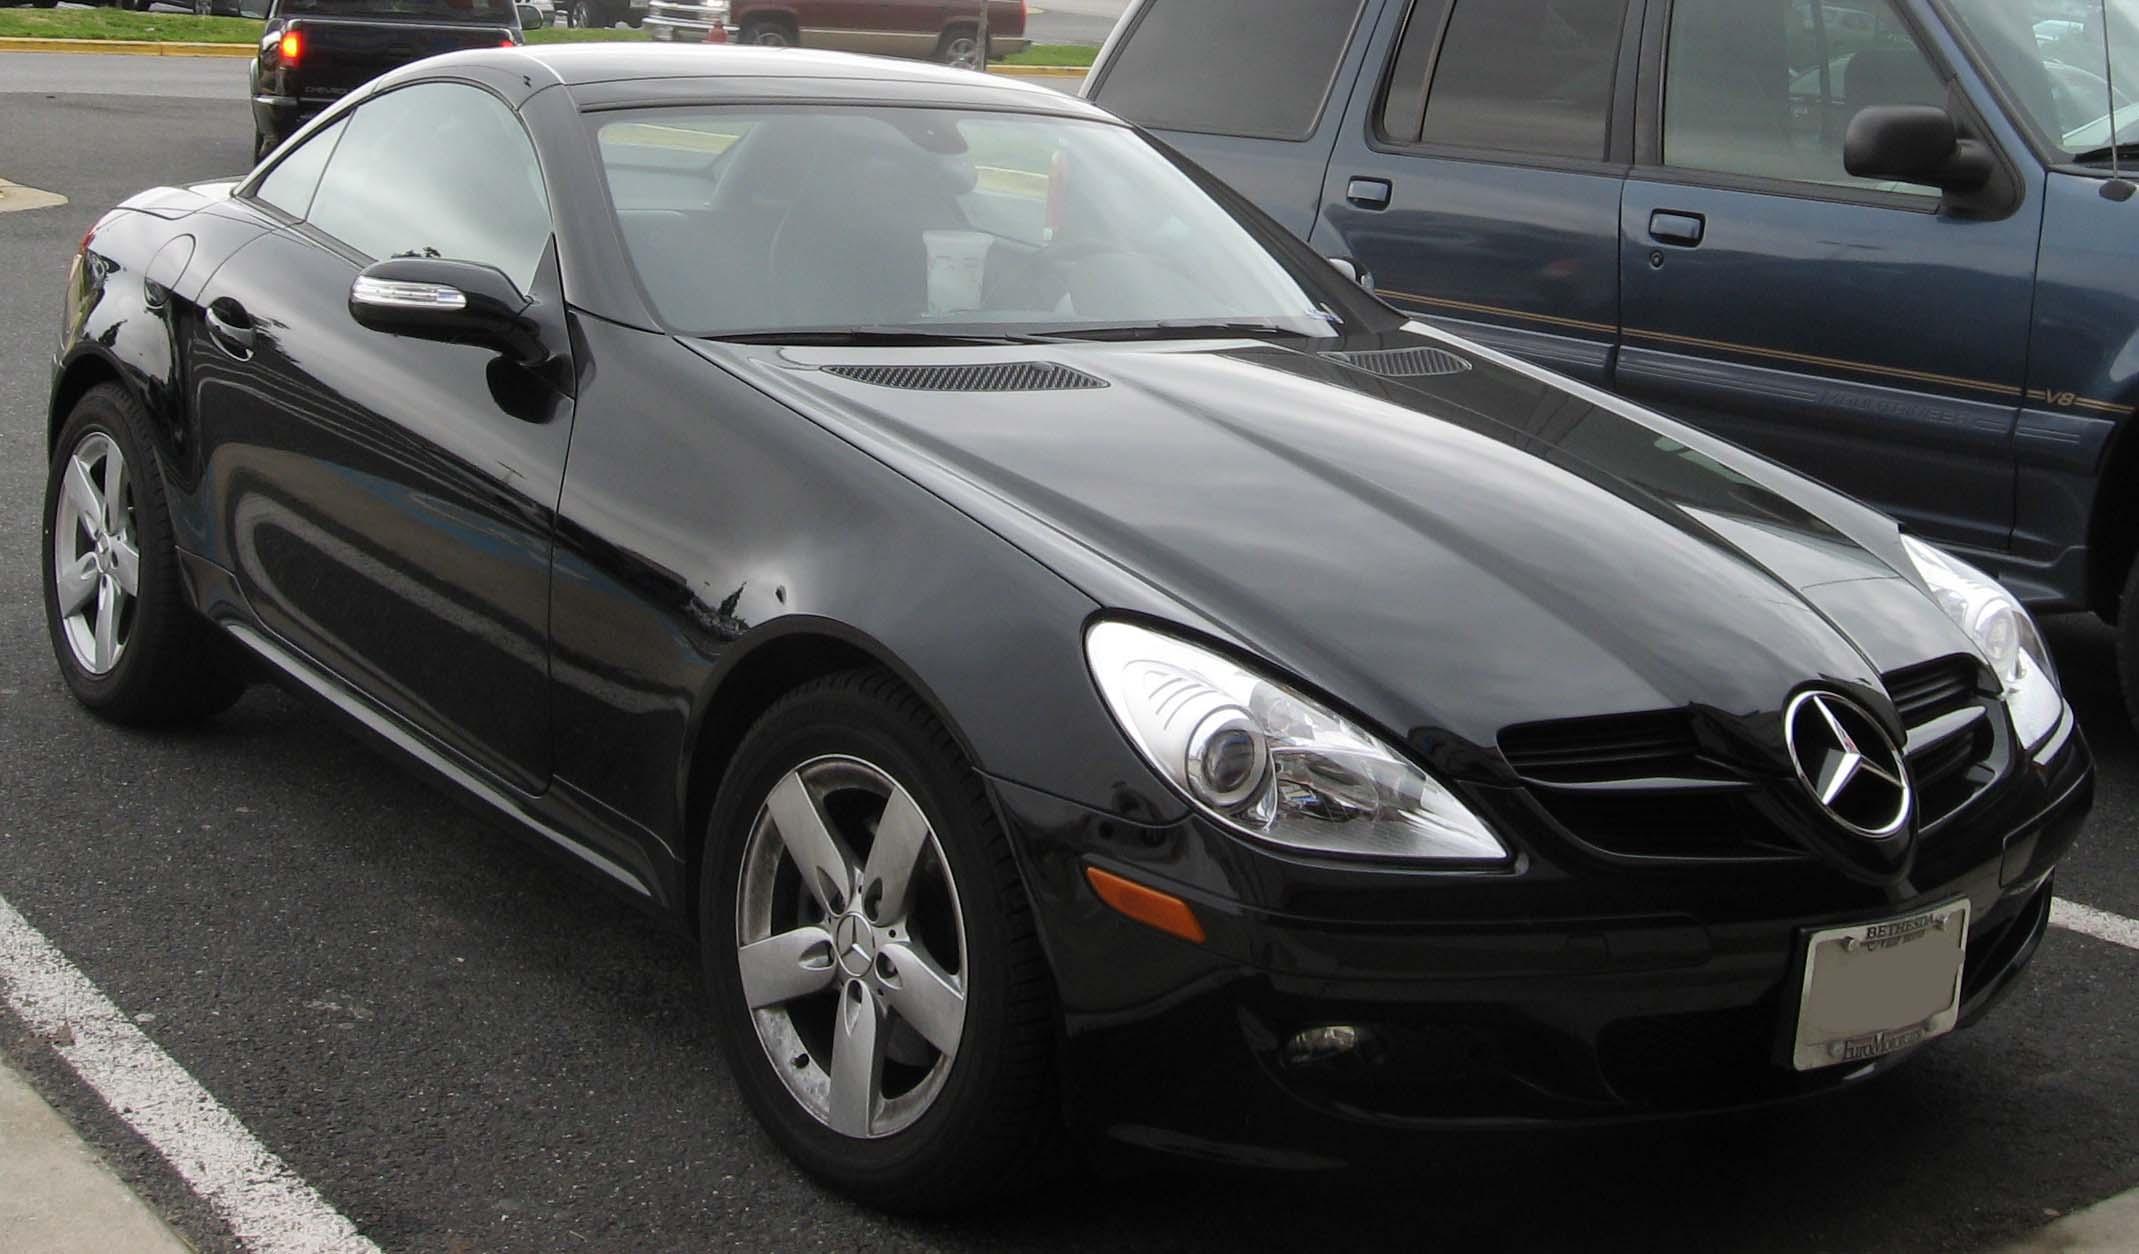 Mercedes benz slk 280 picture 5 reviews news specs for 2007 mercedes benz slk 280 specs